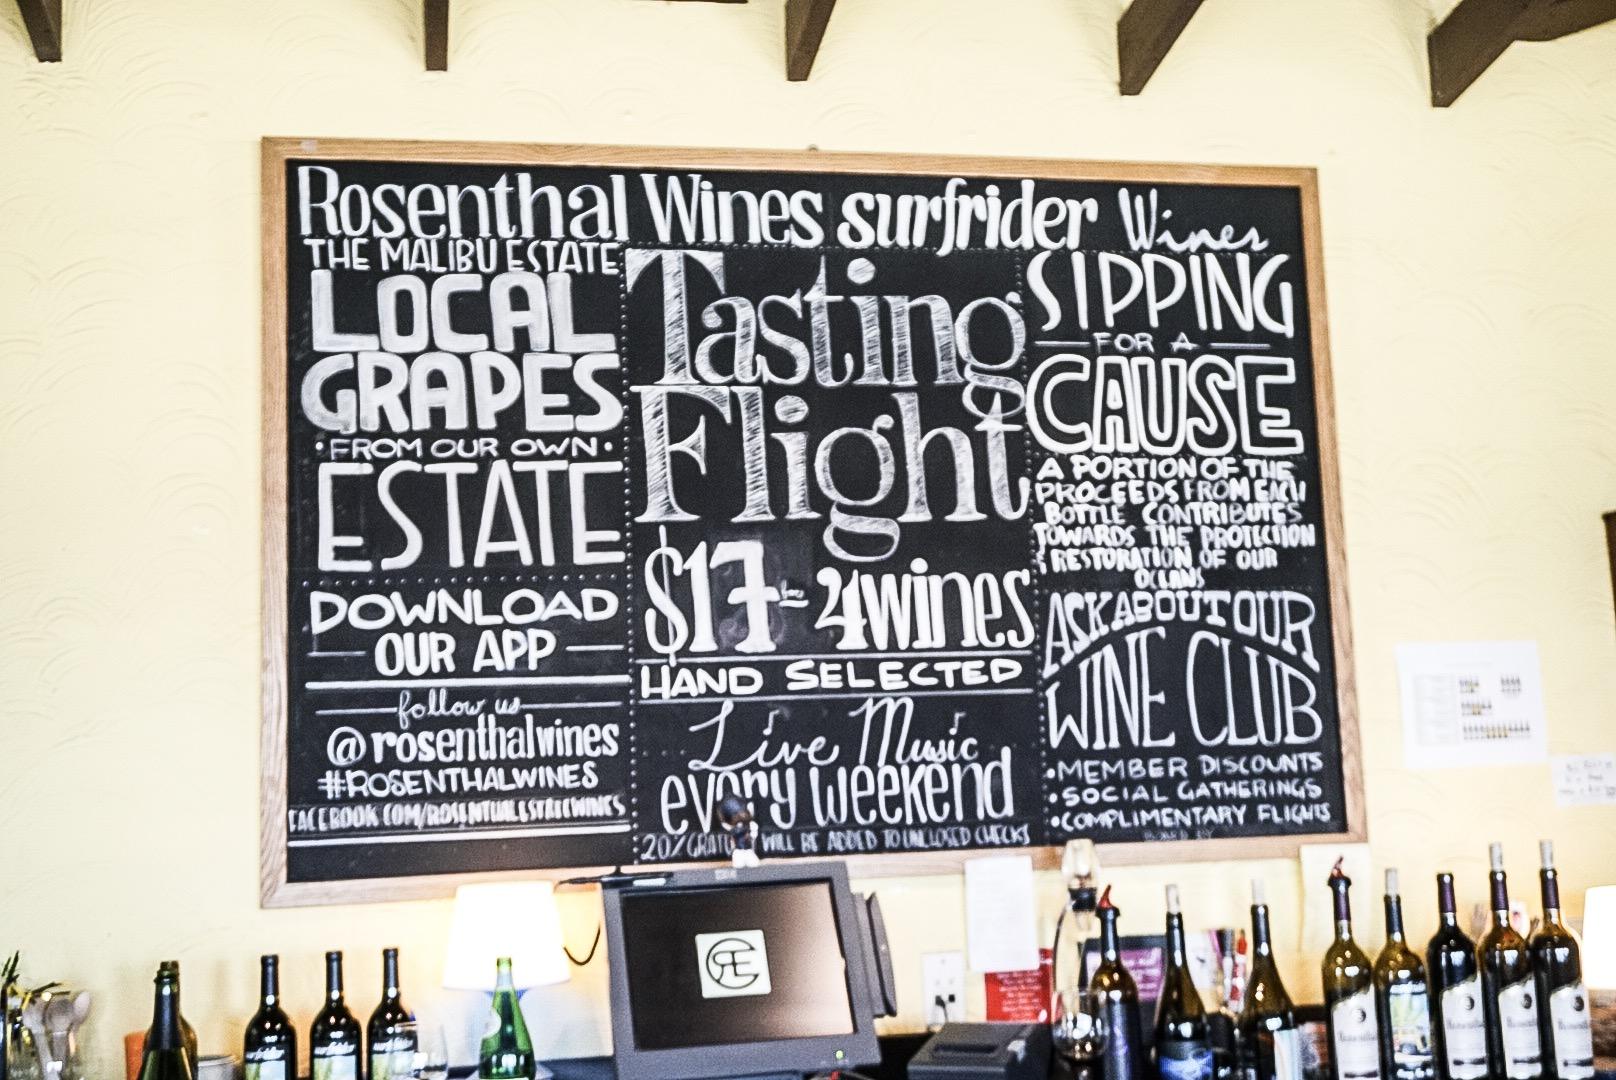 Inside Tasting Room at Rosenthal Wines